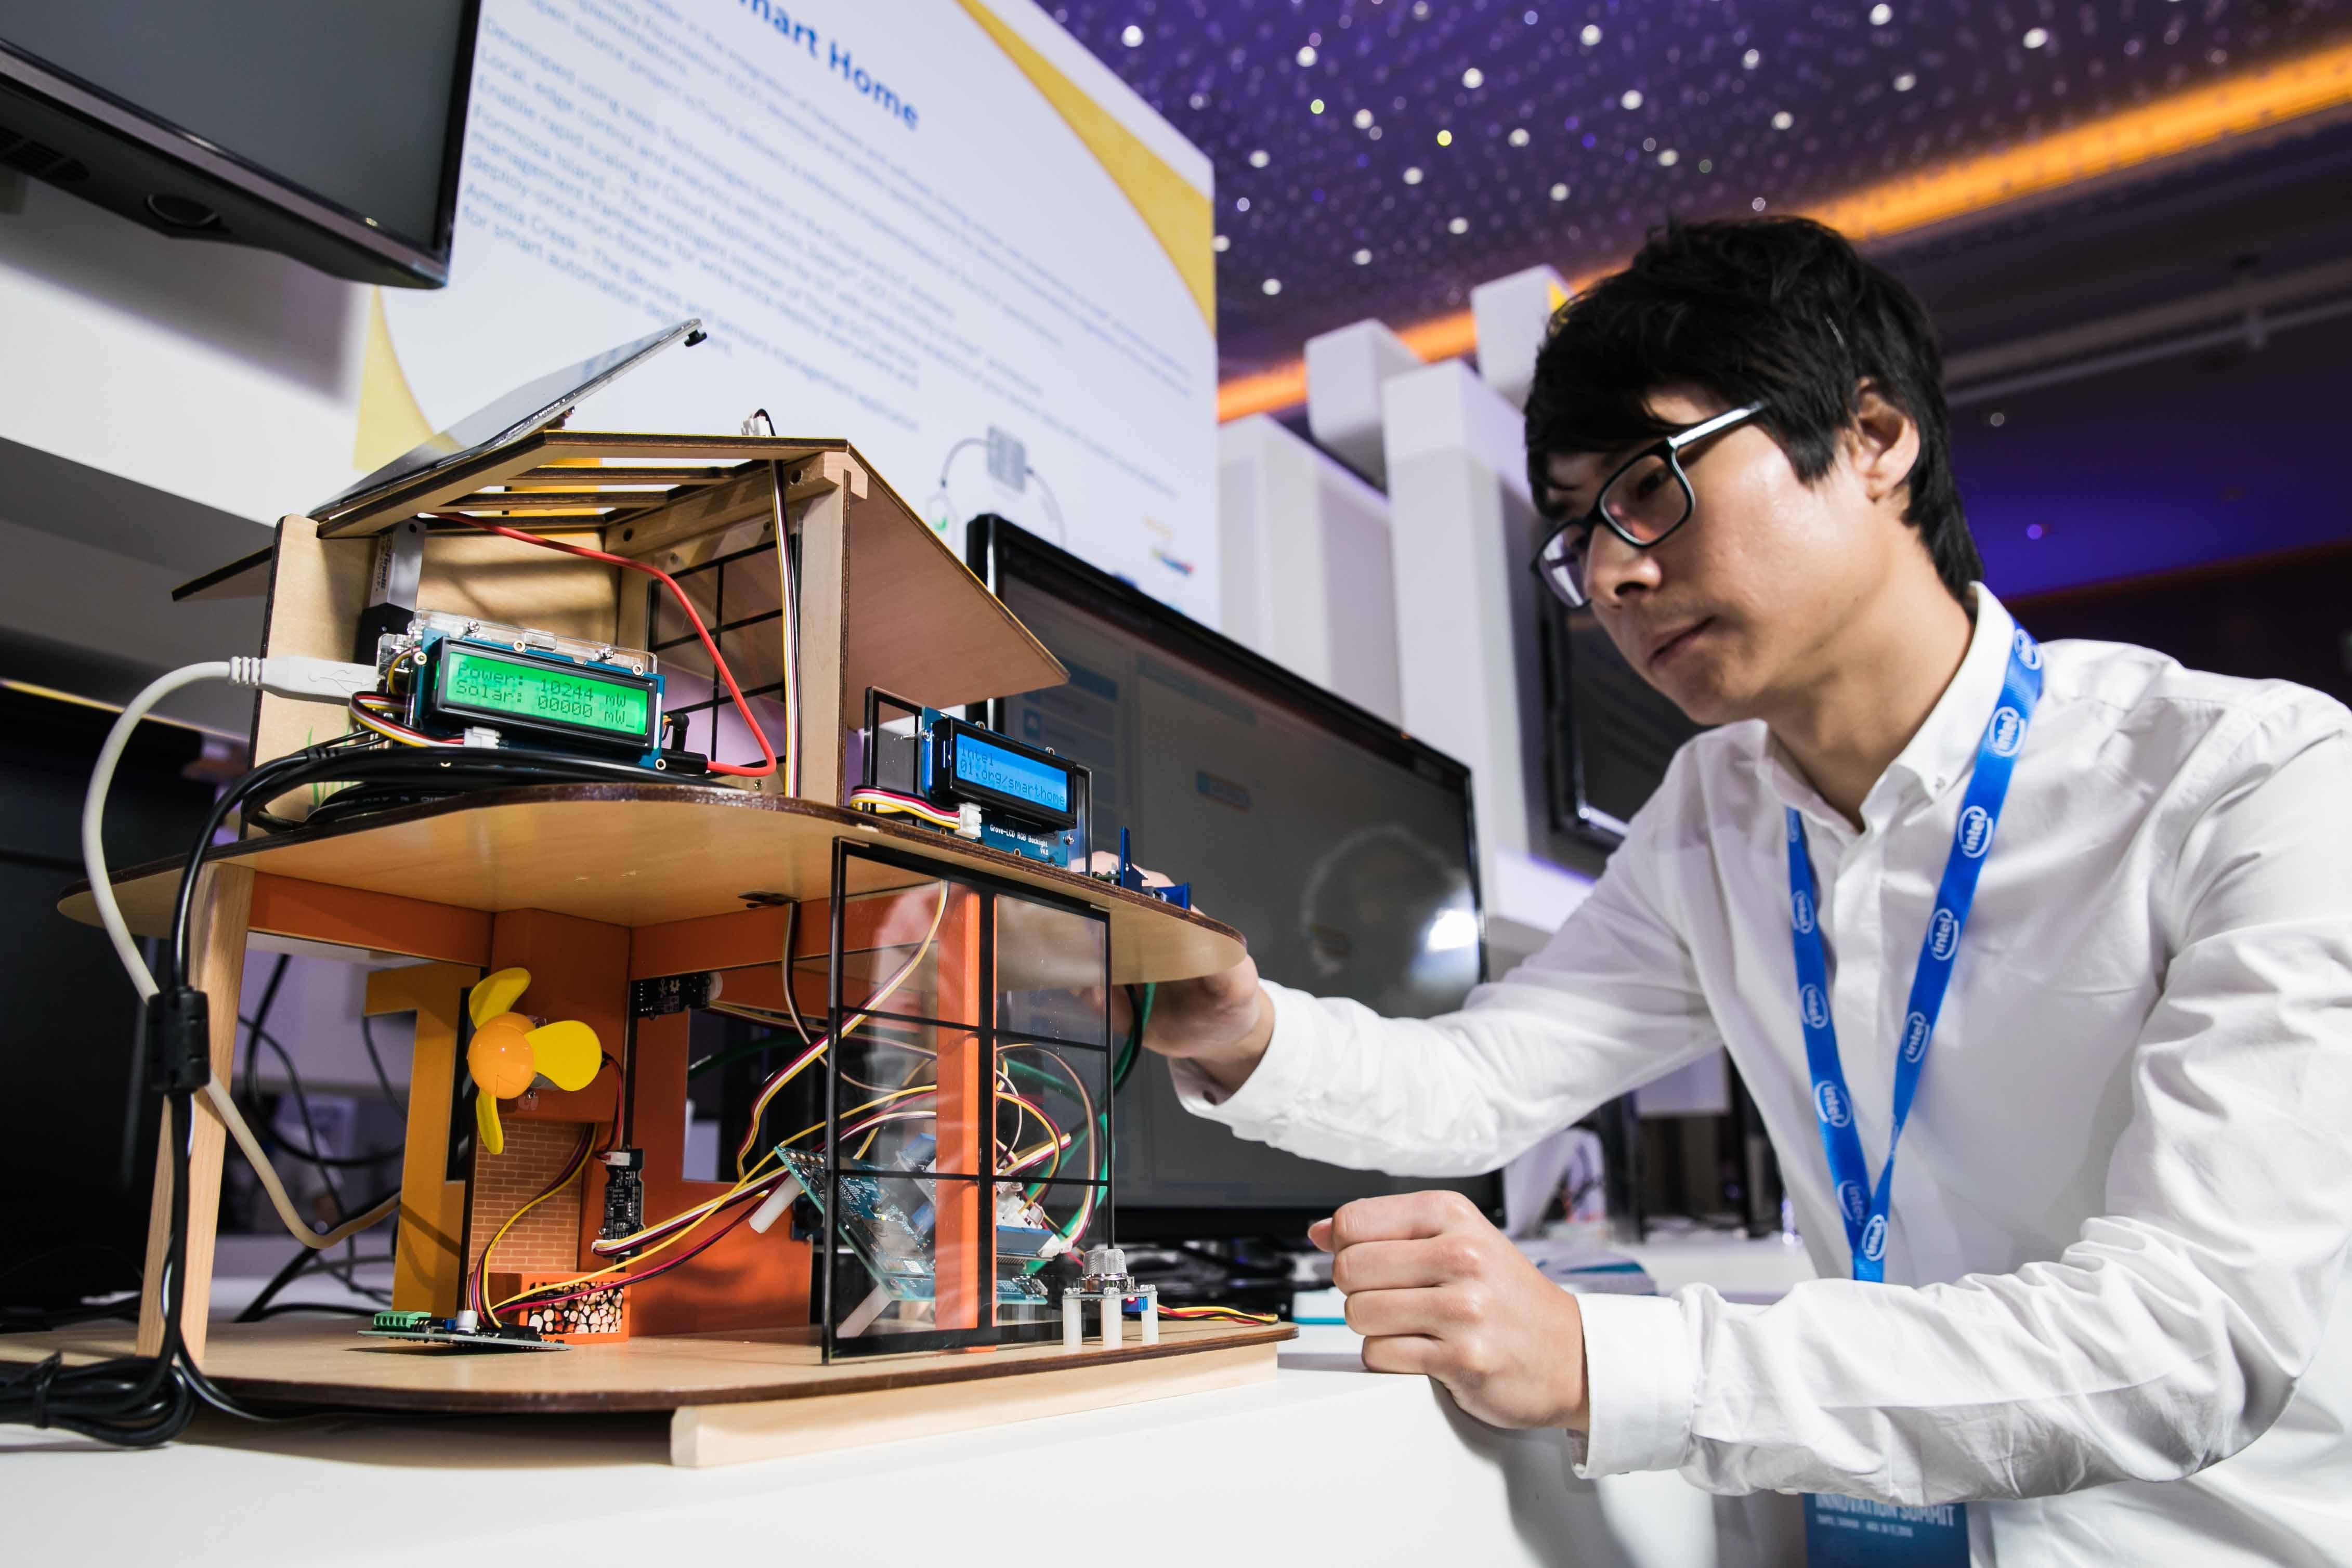 Intel News Photo_5_IoT Cloud Smart Home